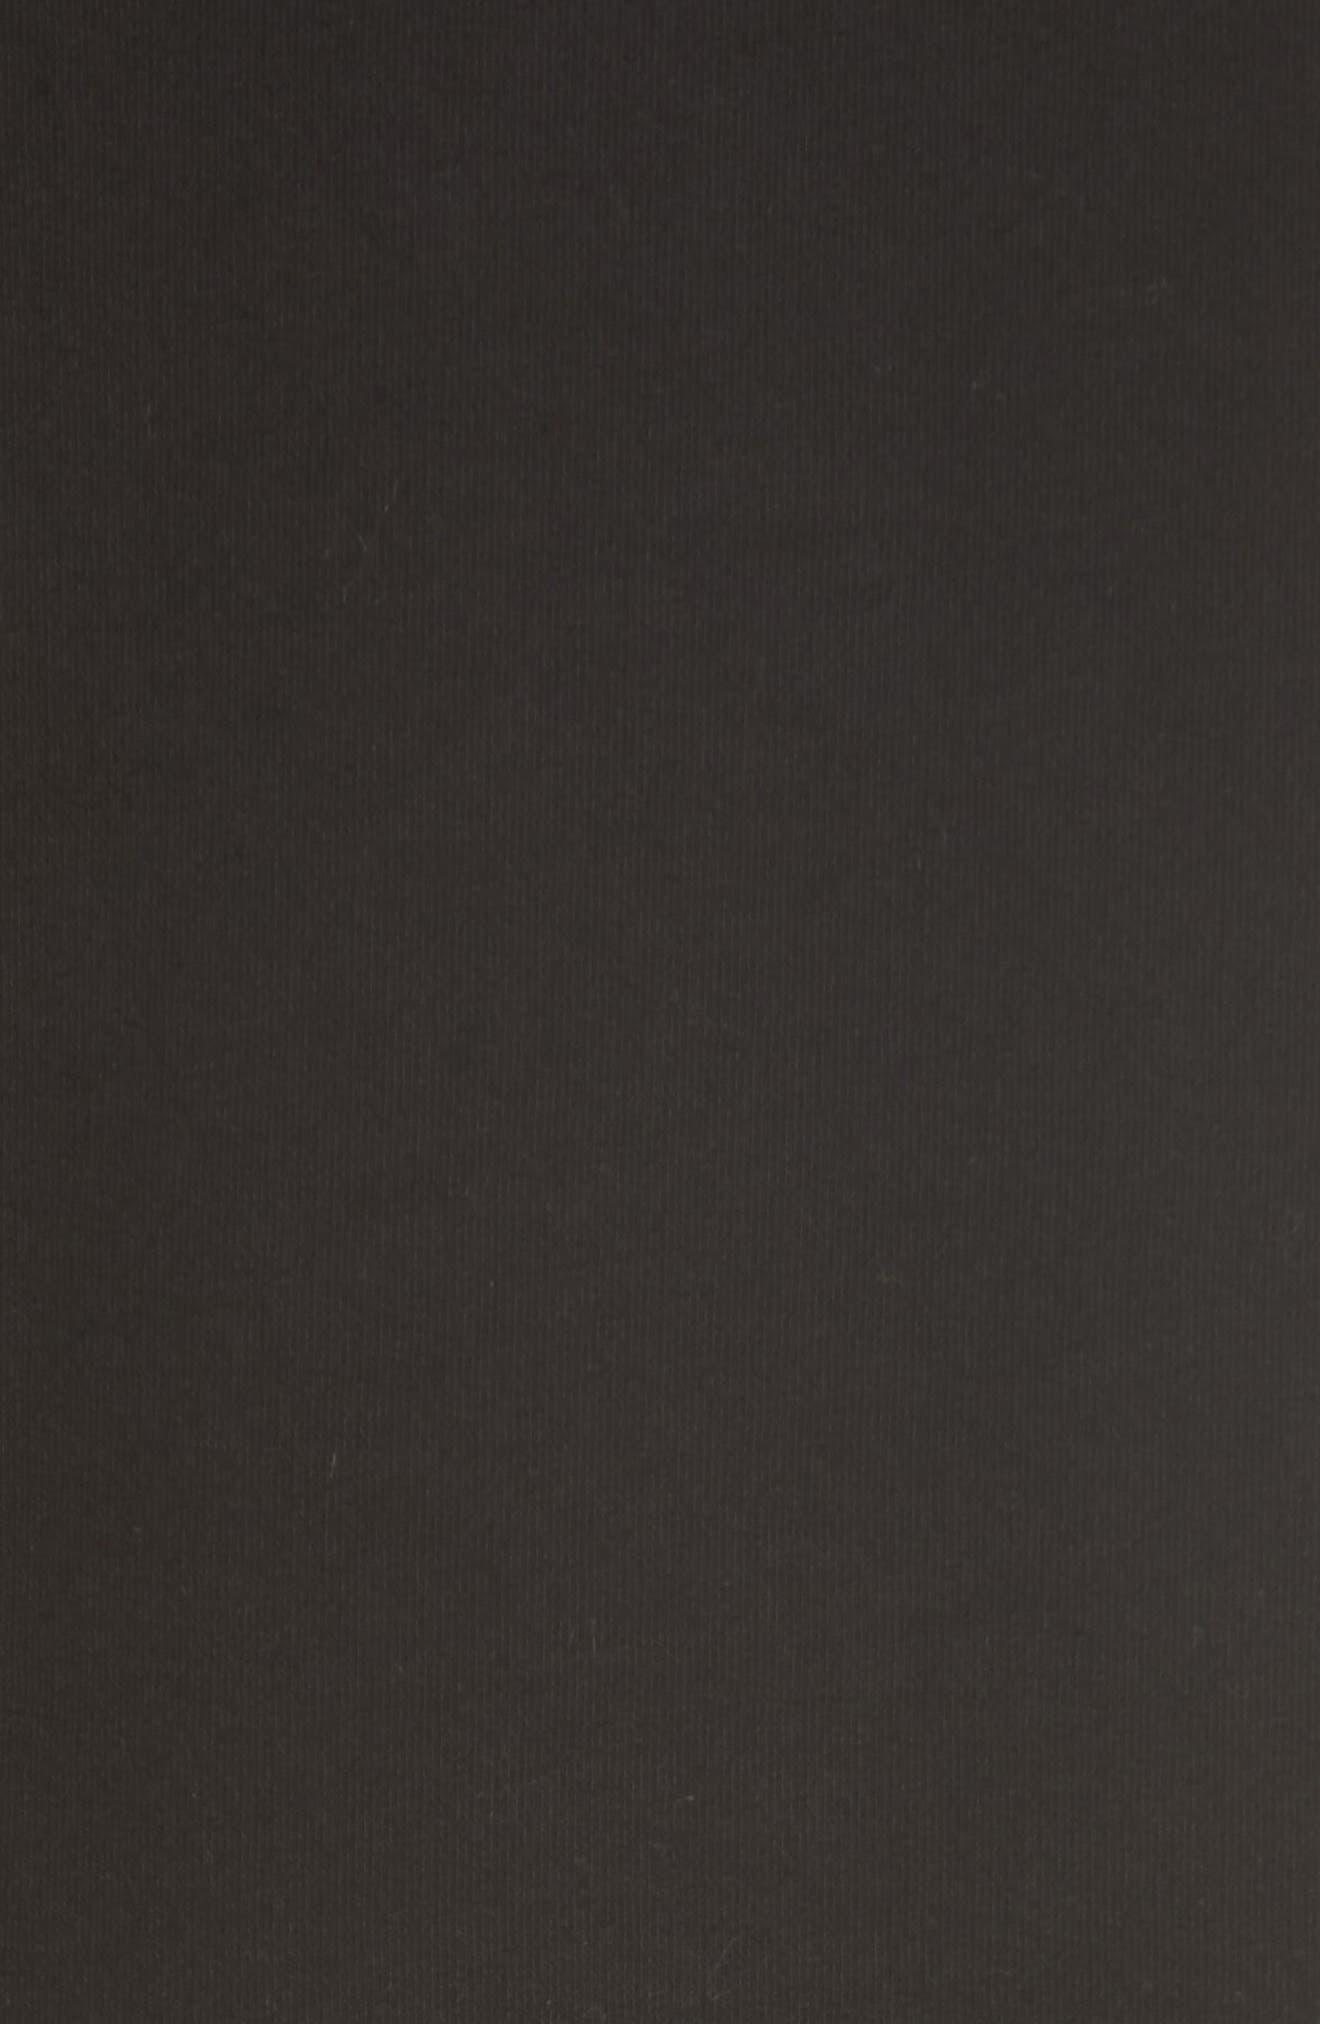 Pleat Ruffle Trim Asymmetrical Dress,                             Alternate thumbnail 5, color,                             Black/ Black